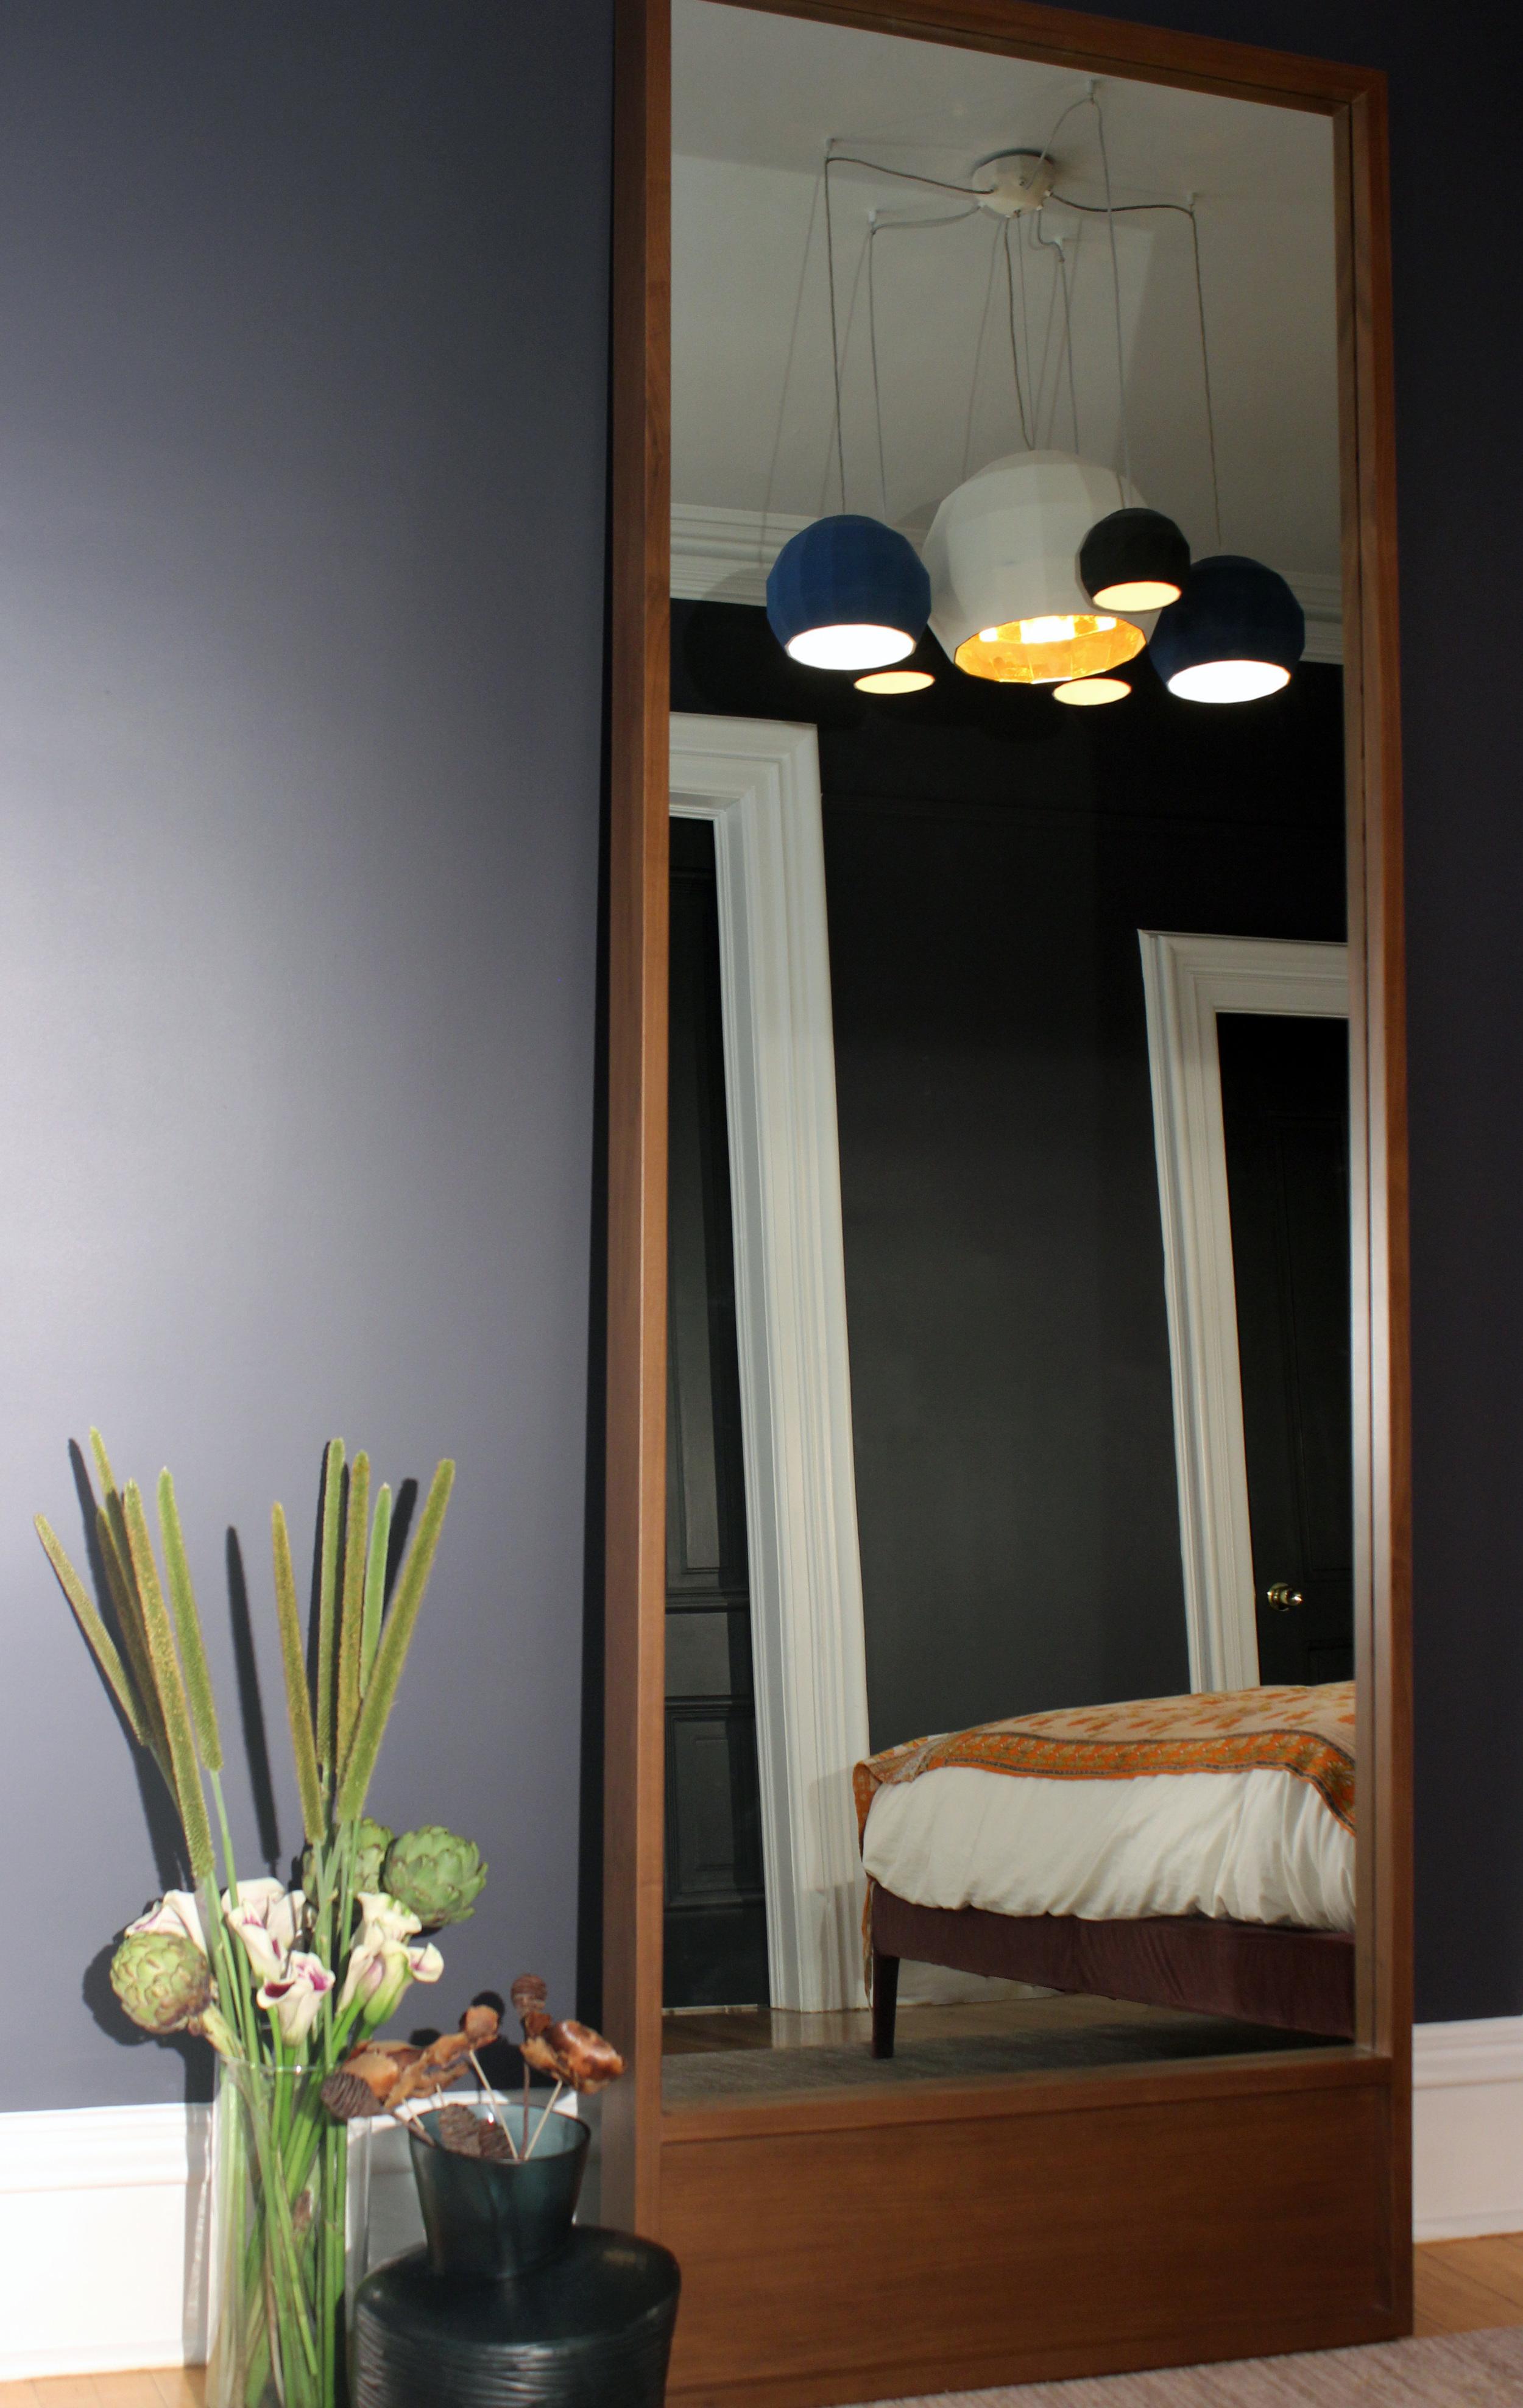 SINOWAY_Pilson-Residence-LIGHT-medium.jpg